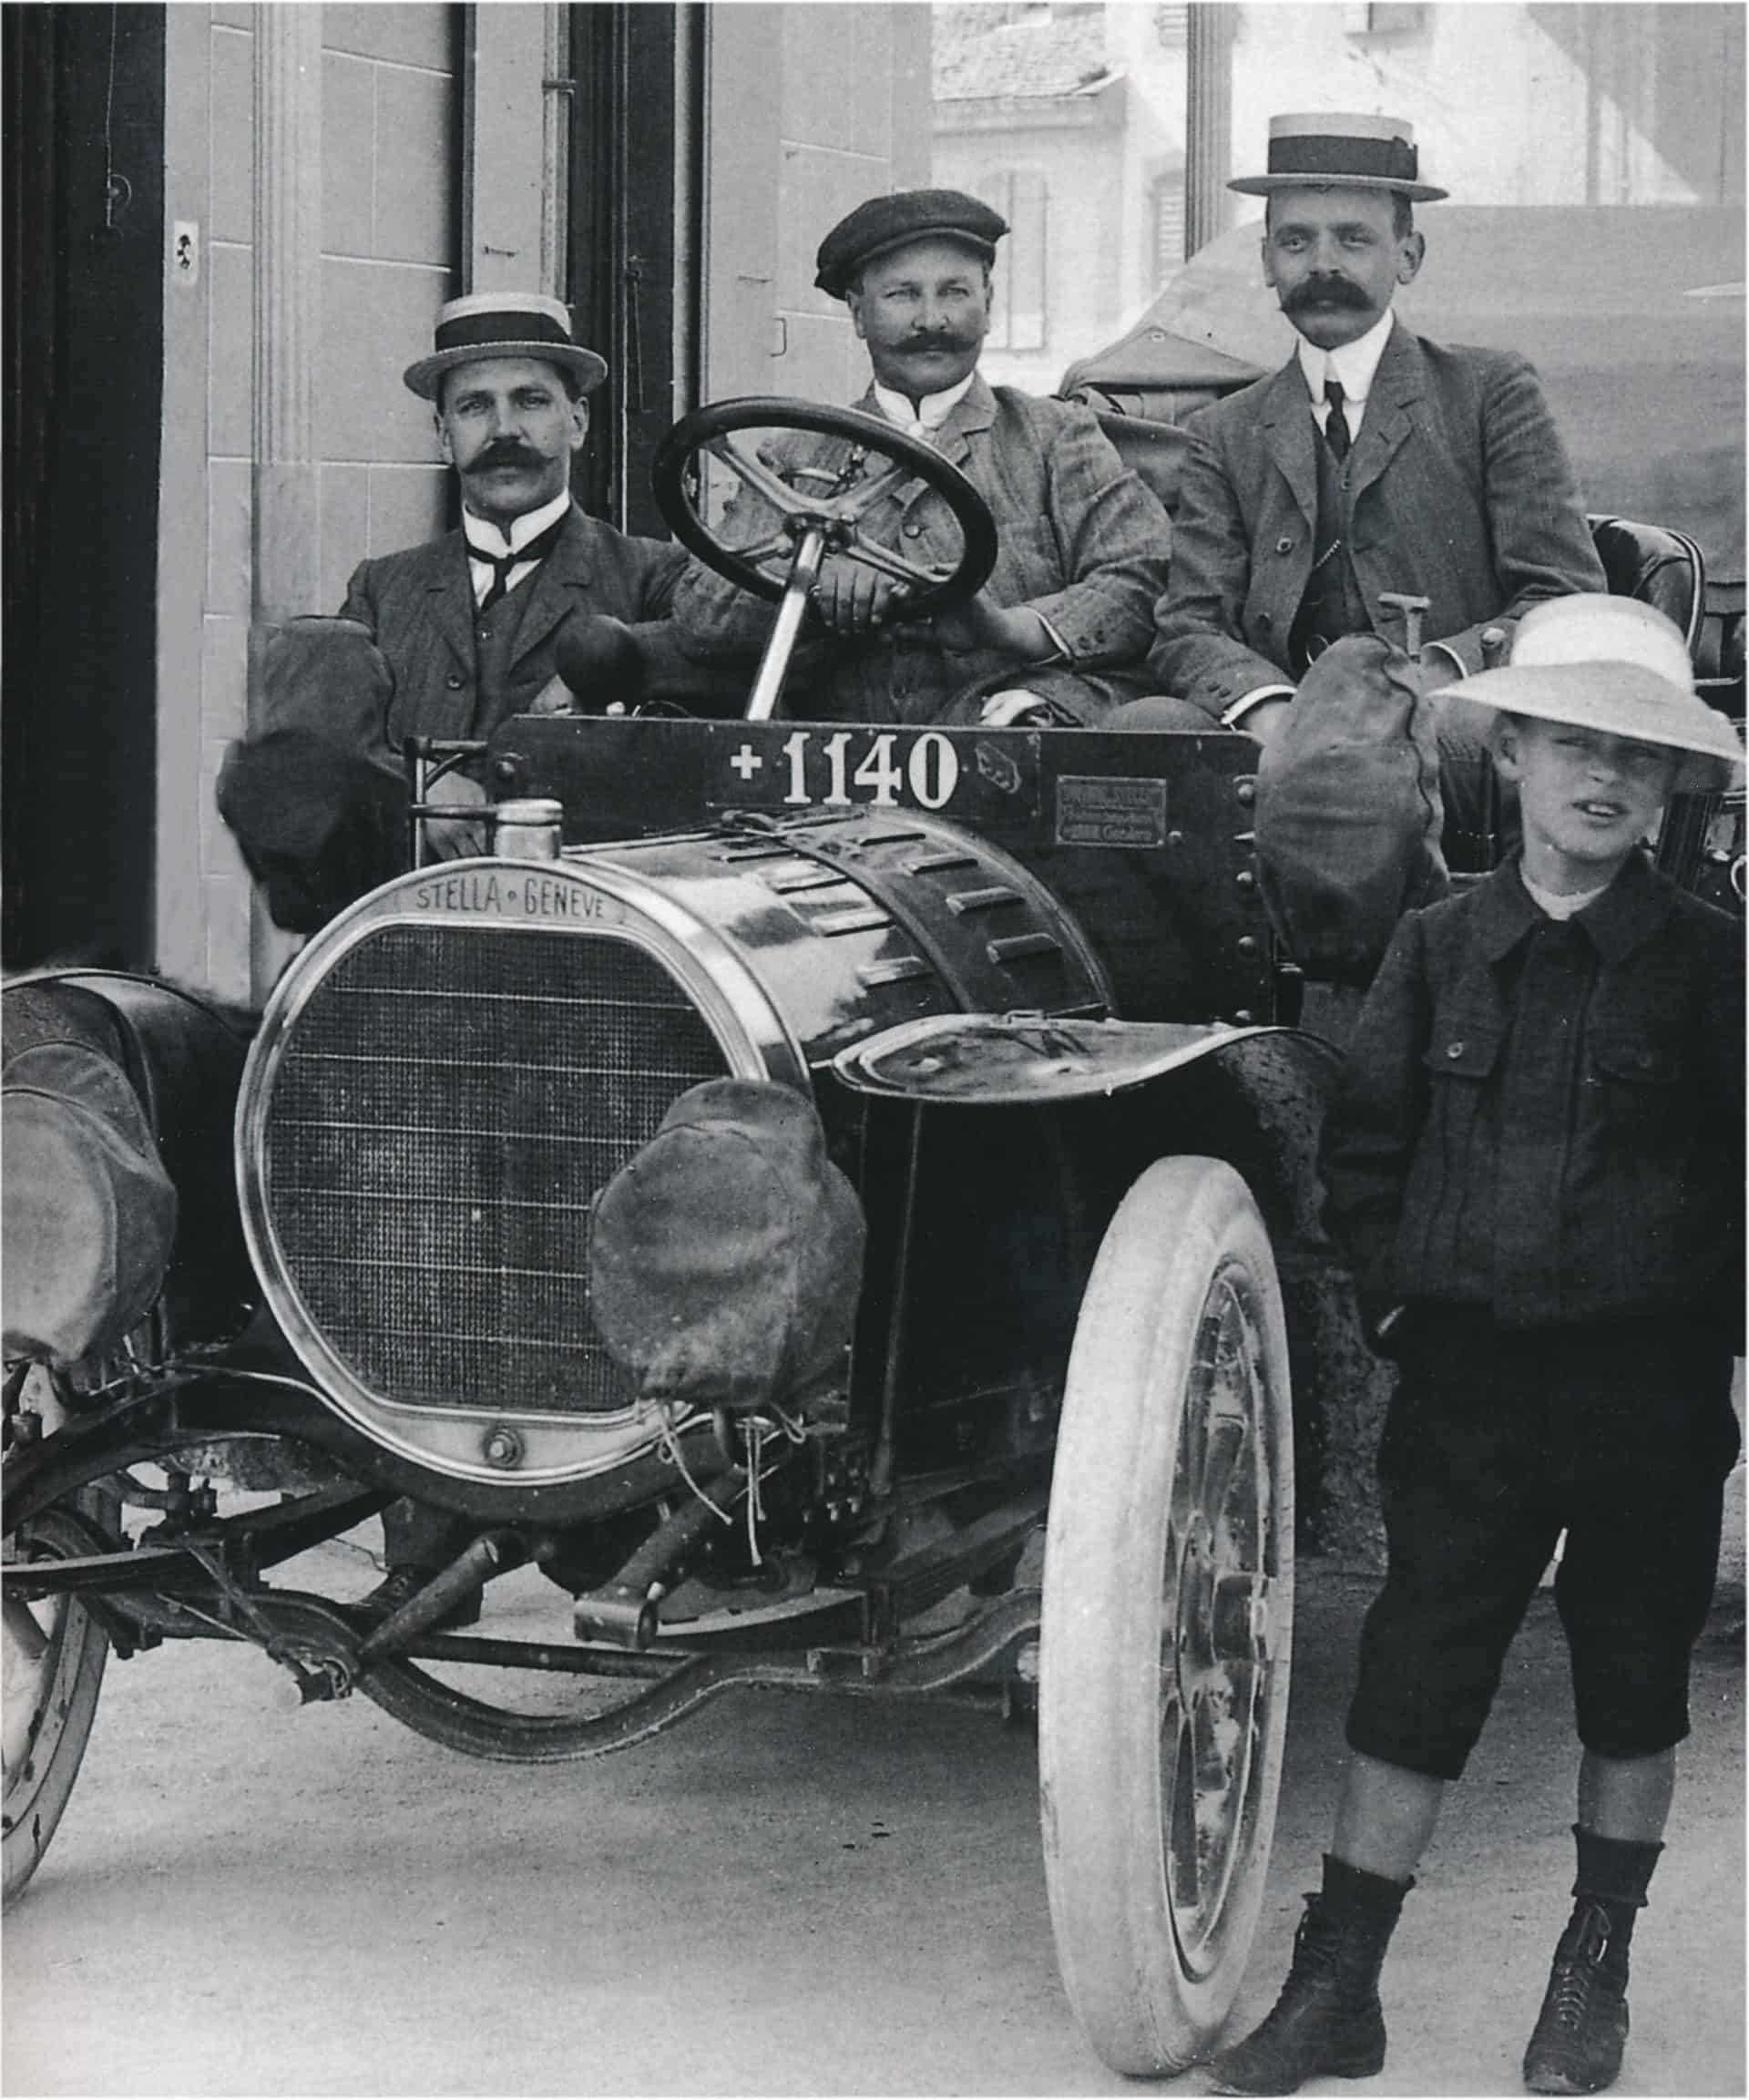 Brueder Robert 1909 in Villeret